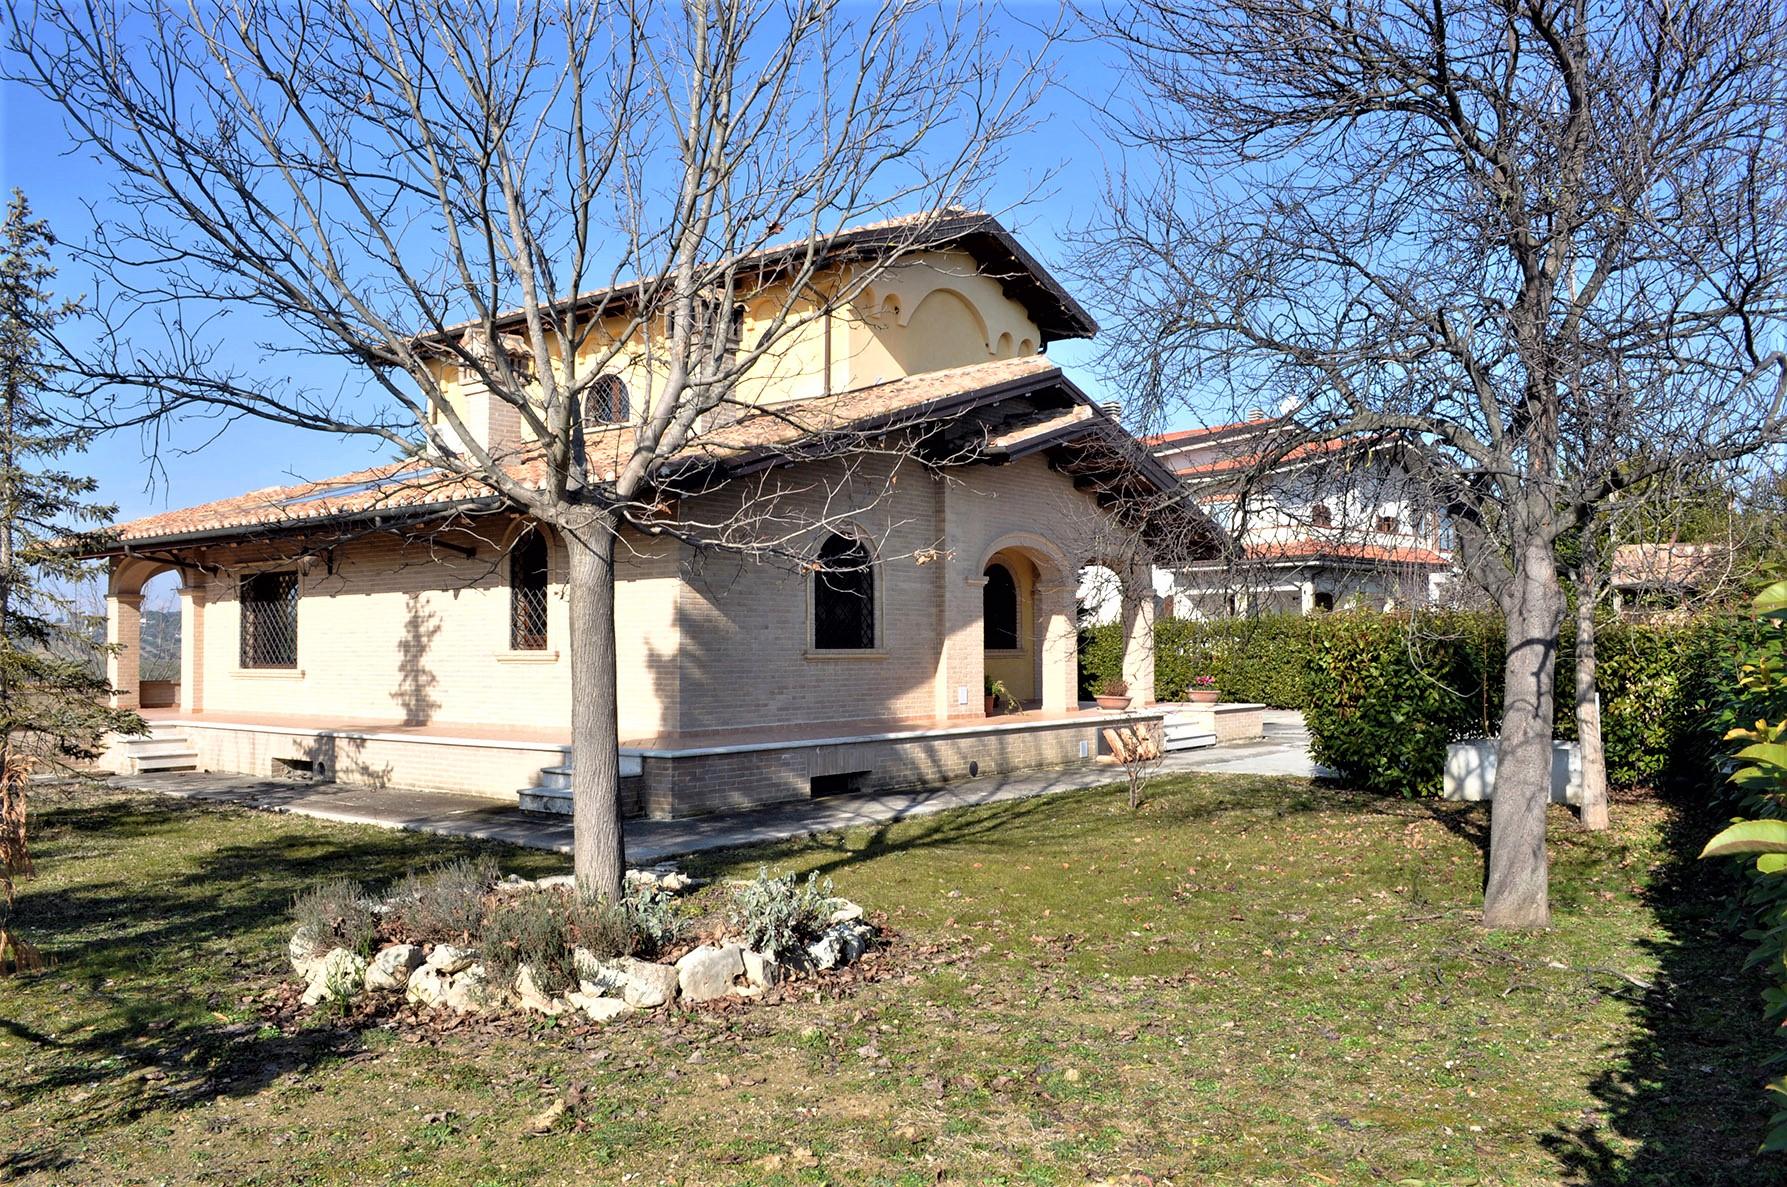 Villa Villa for sale Tortoreto (TE), Villa Bianca - Tortoreto - EUR 770.233 380